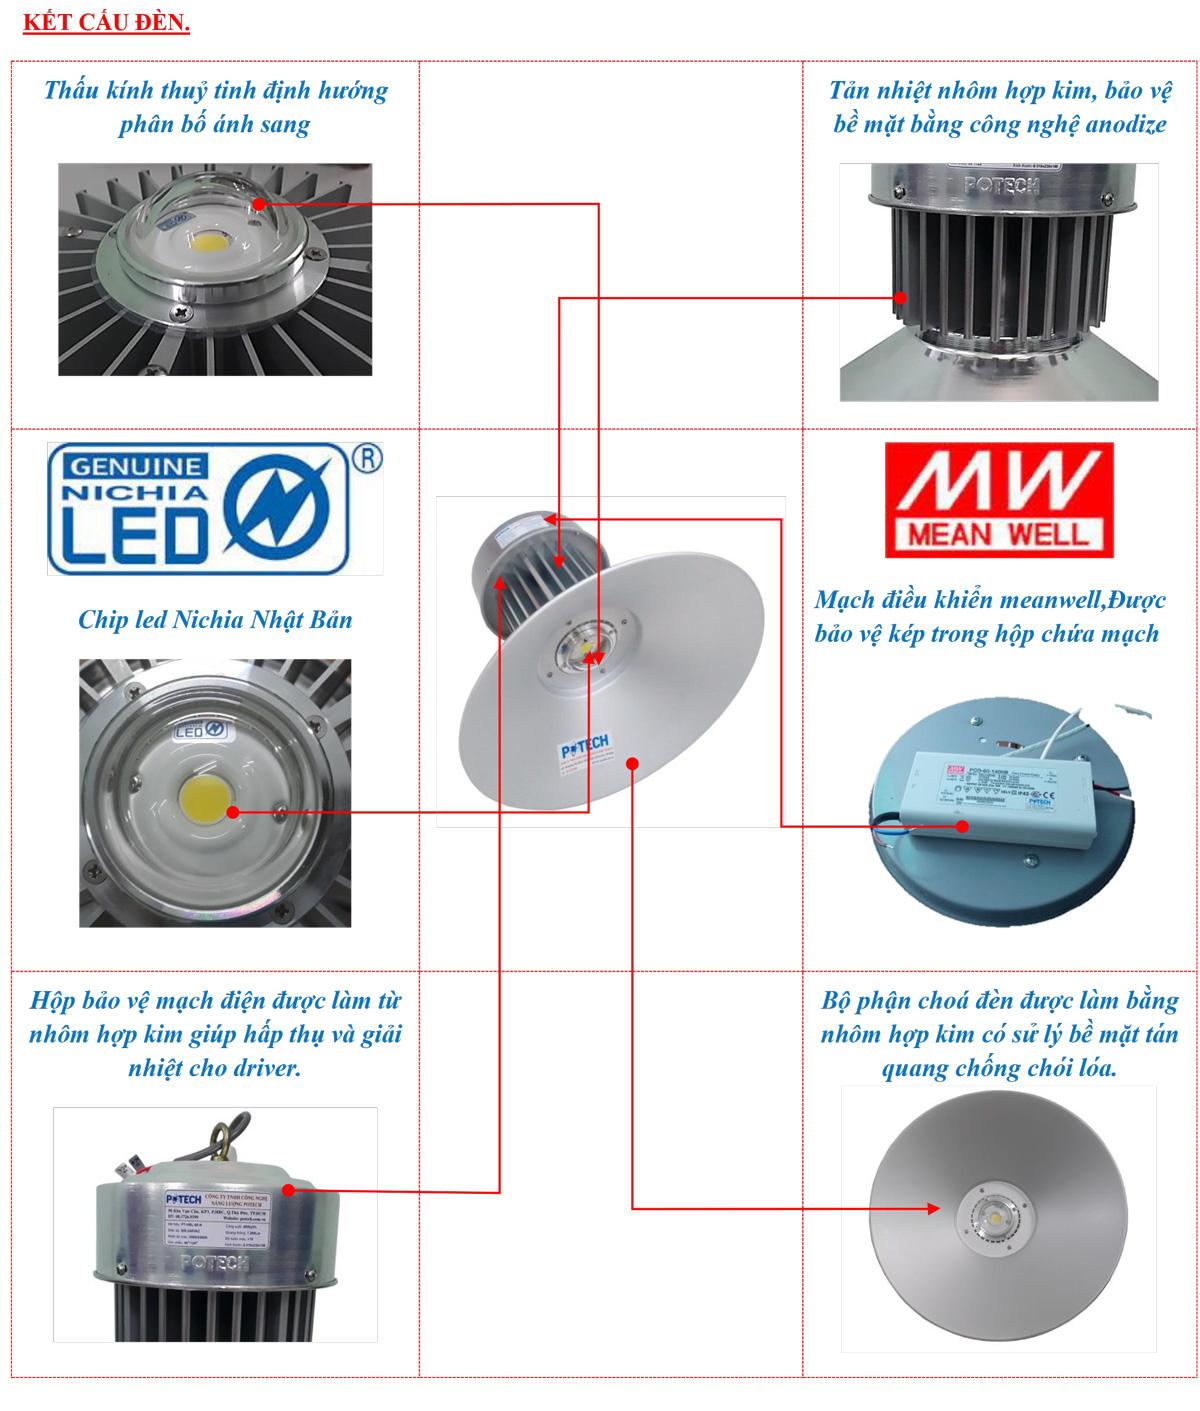 Kết cấu đèn LED 40w - 60w